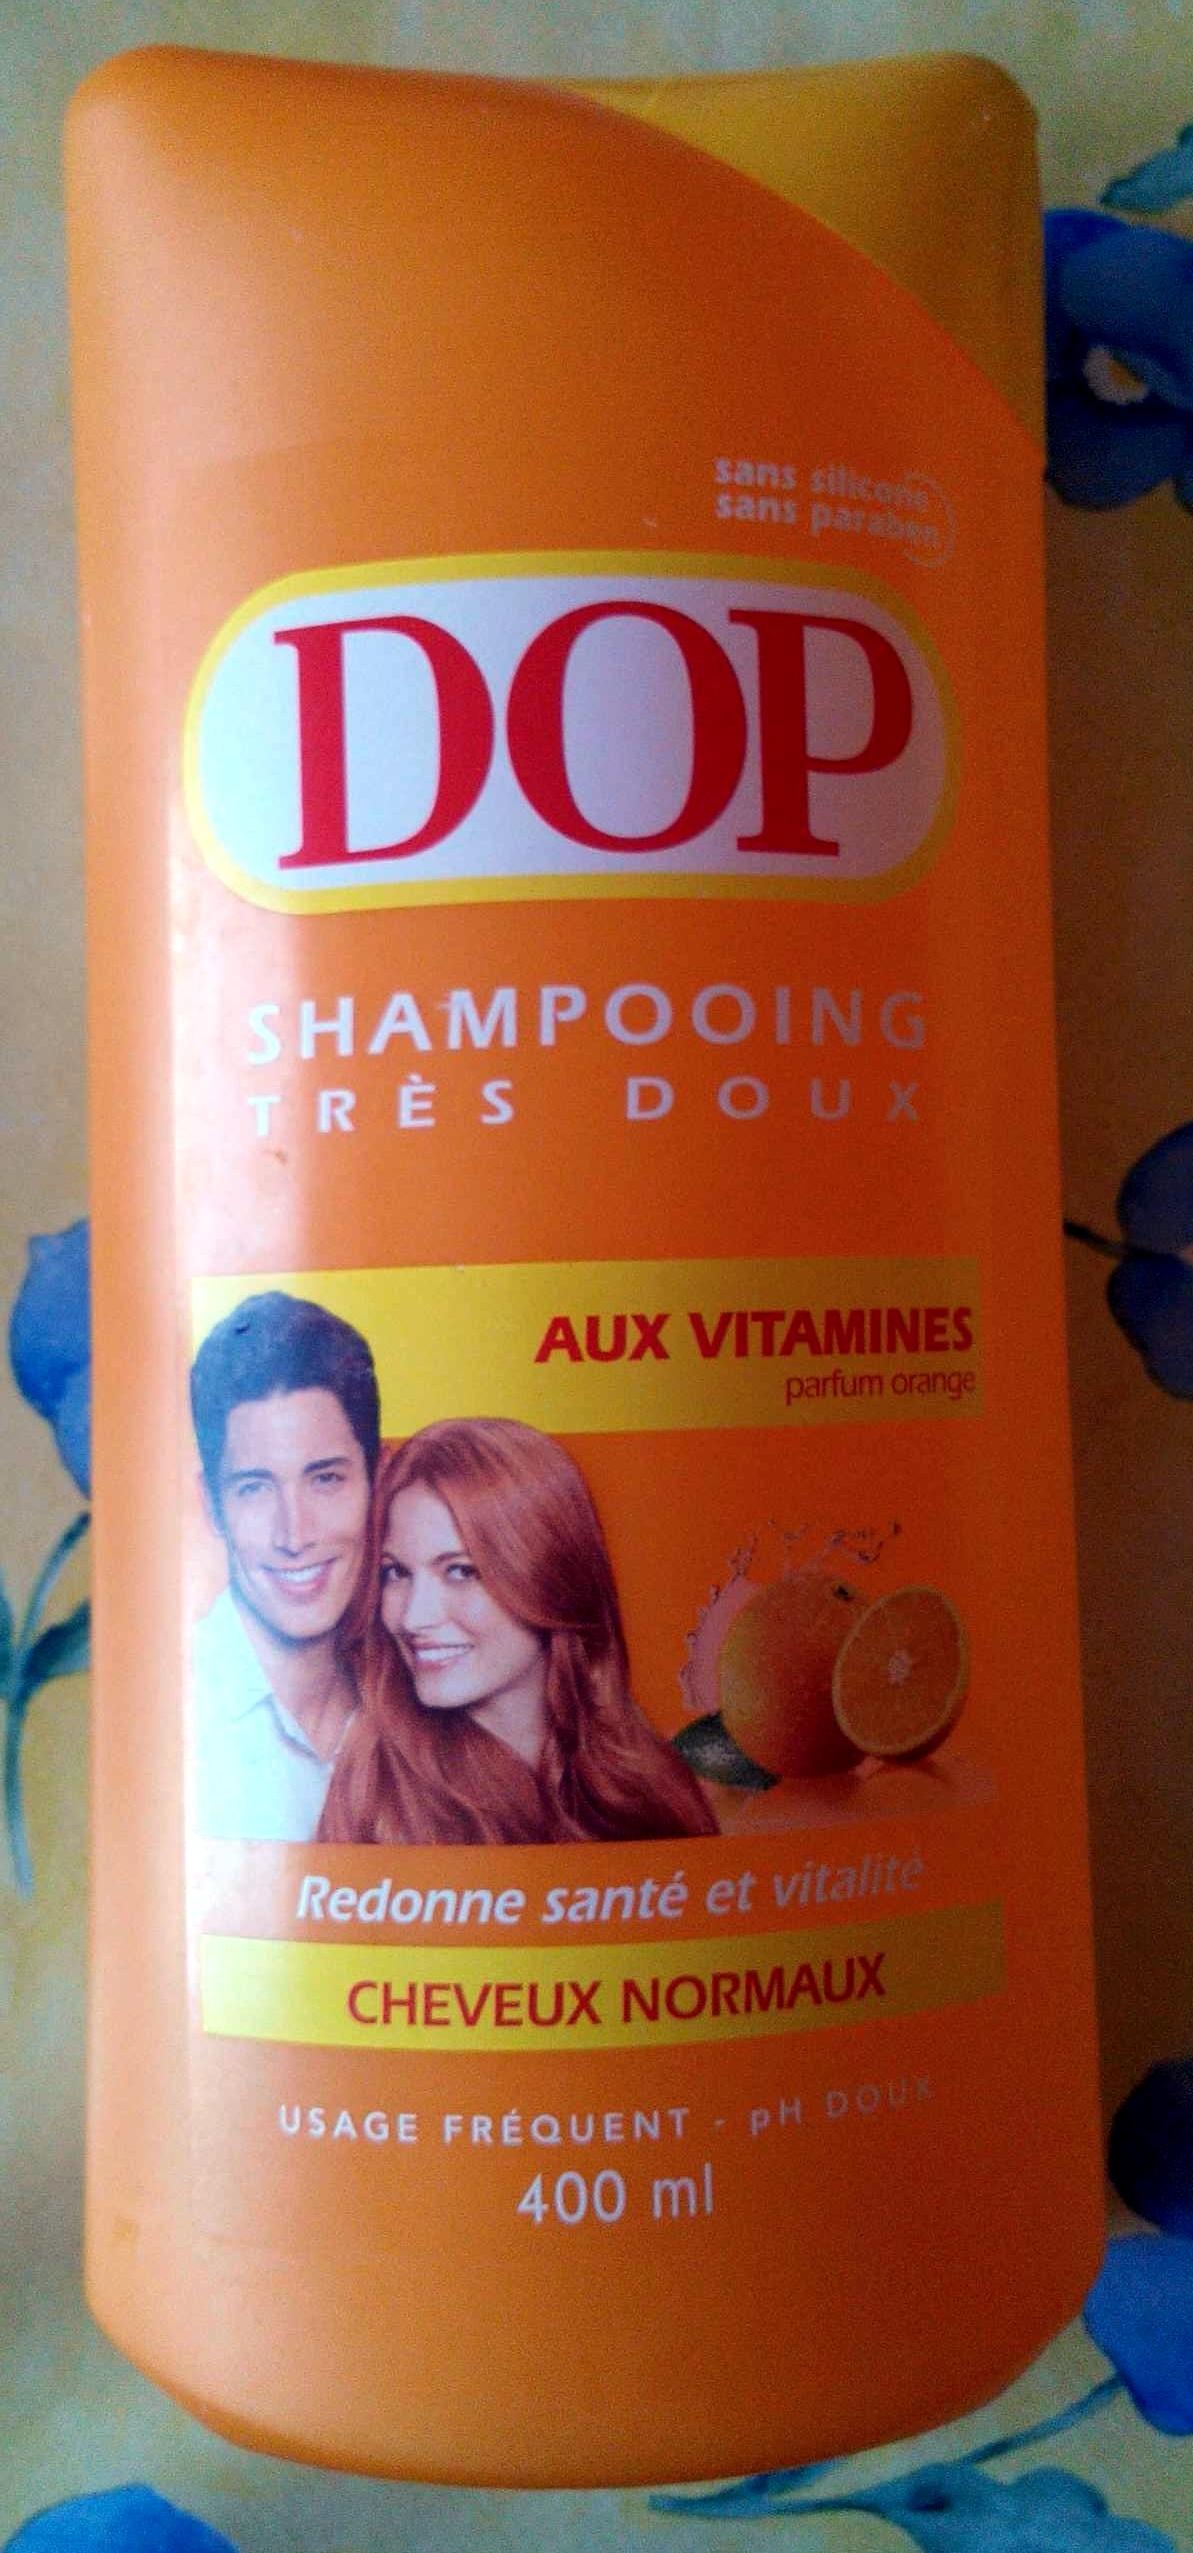 Shampooing très doux aux vitamines - Product